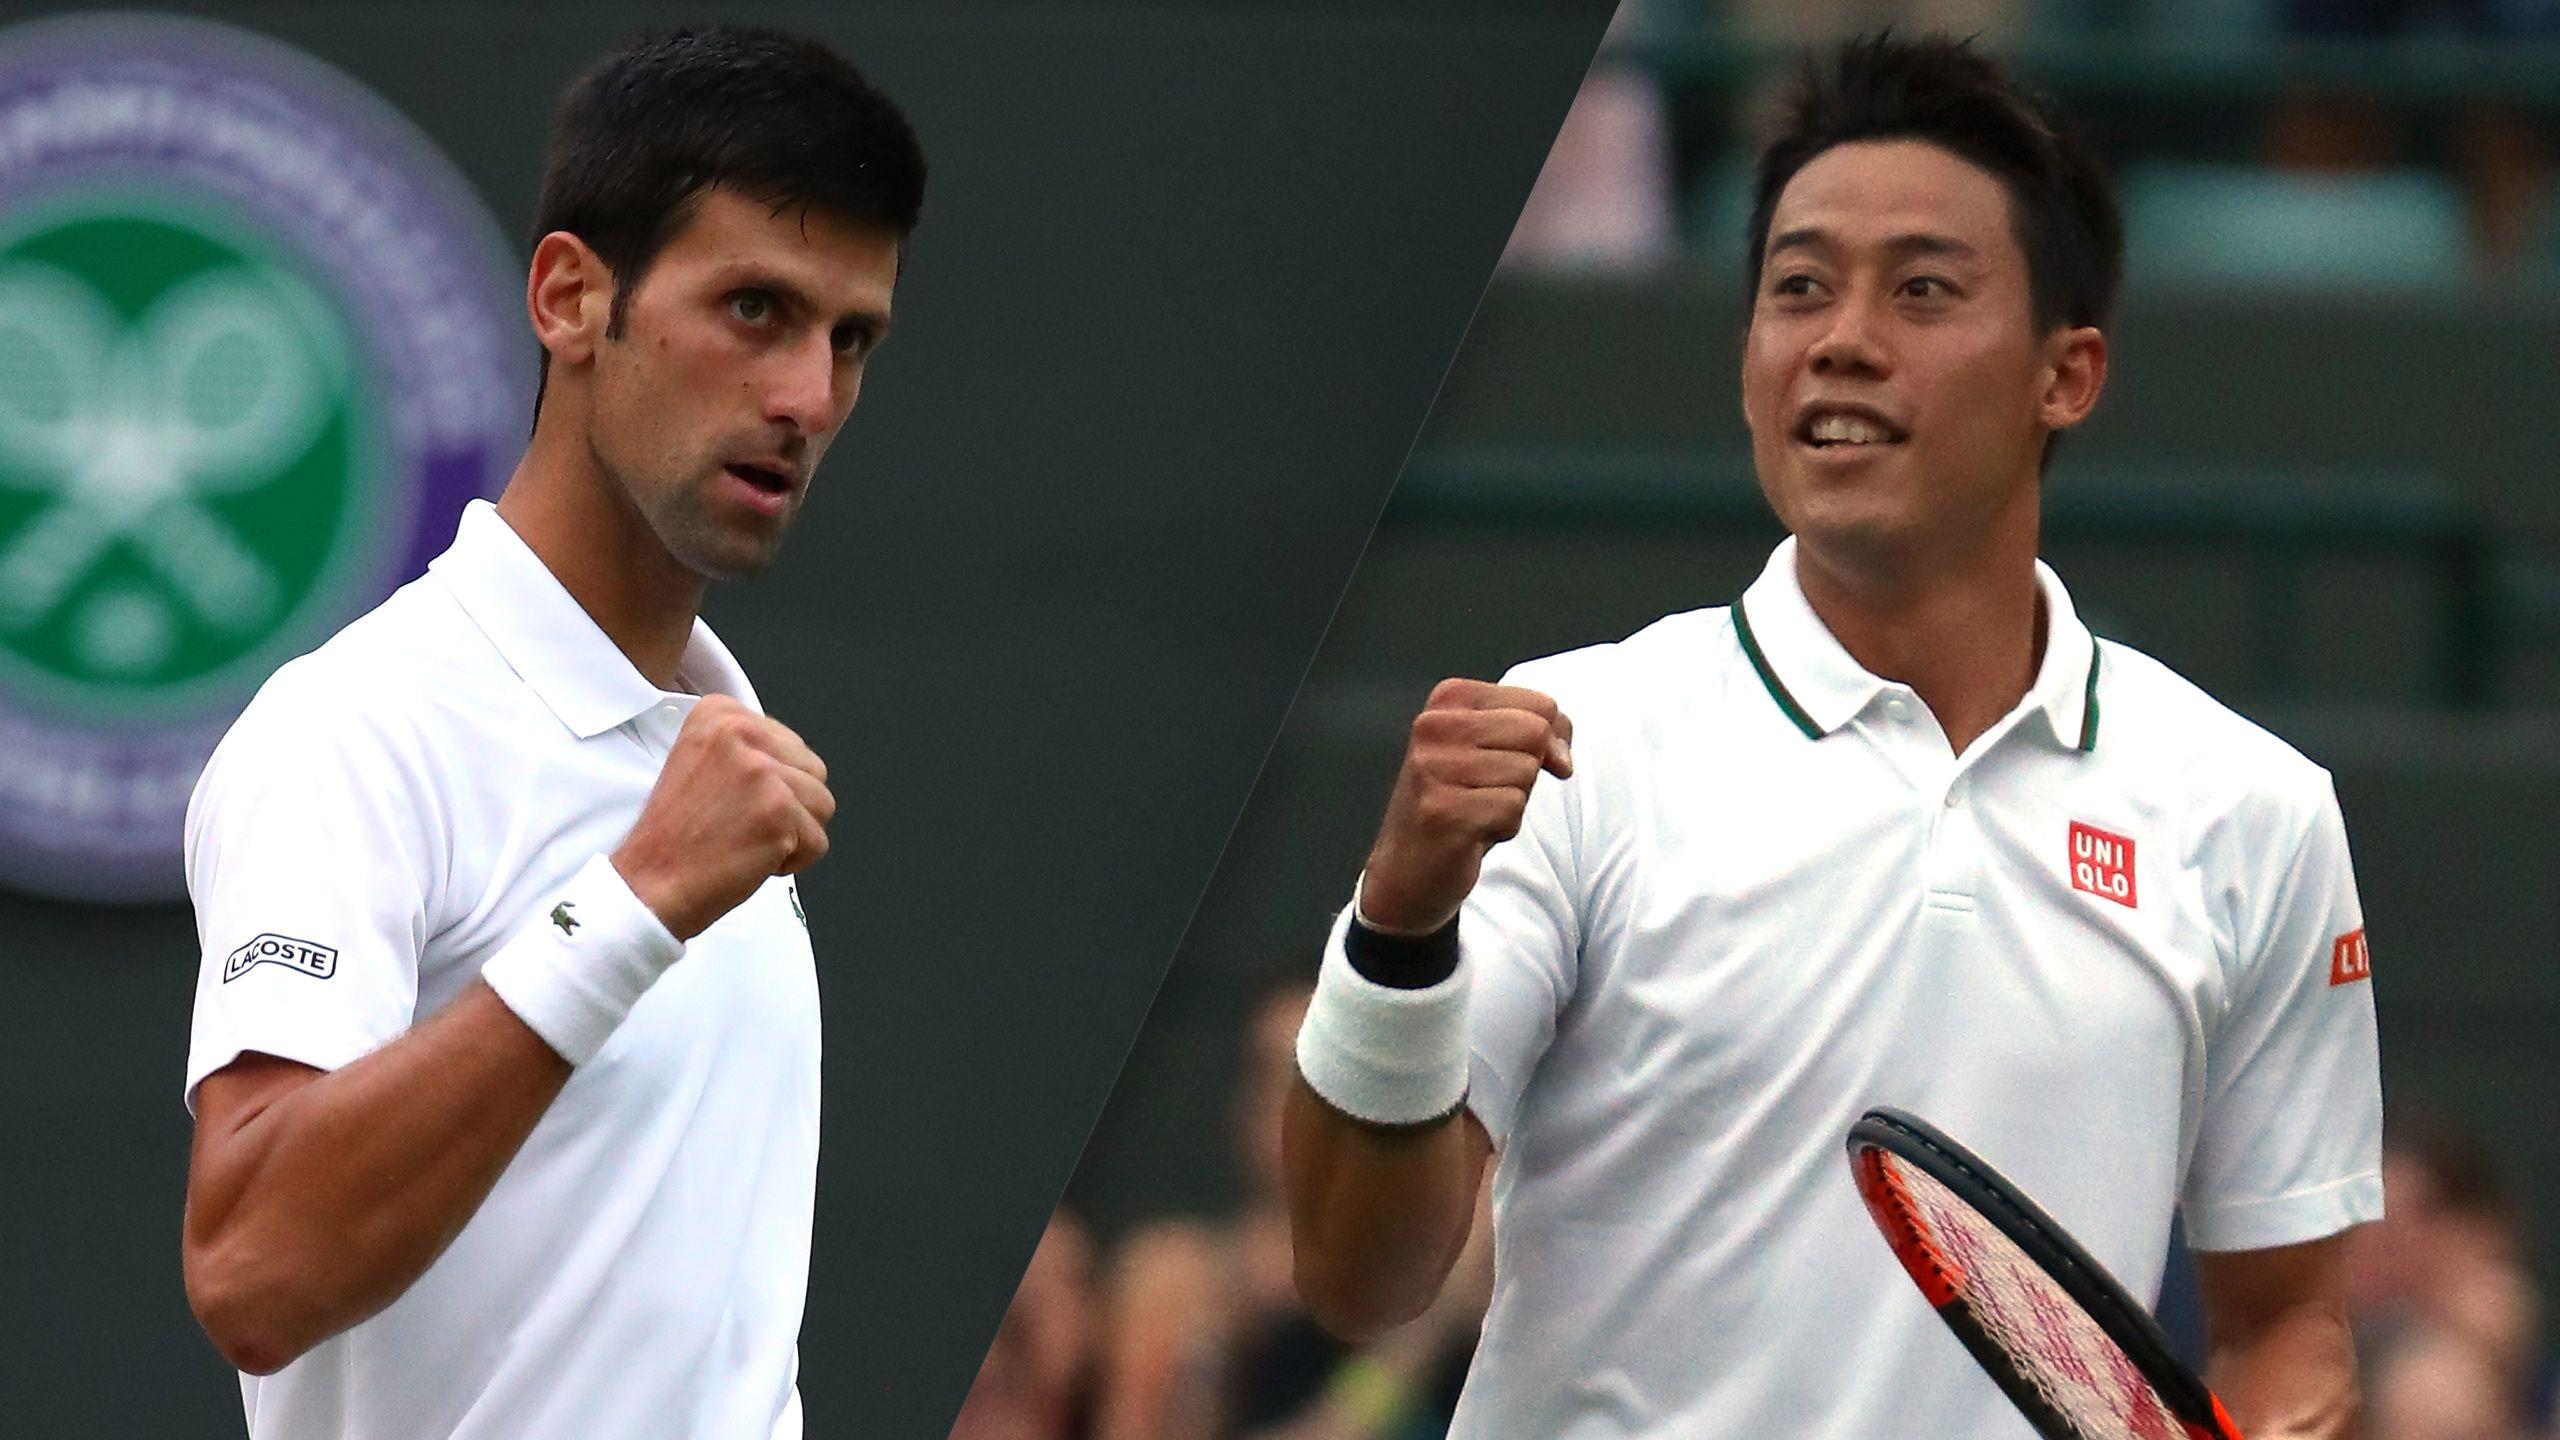 (12) Djokovic vs. (24) Nishikori